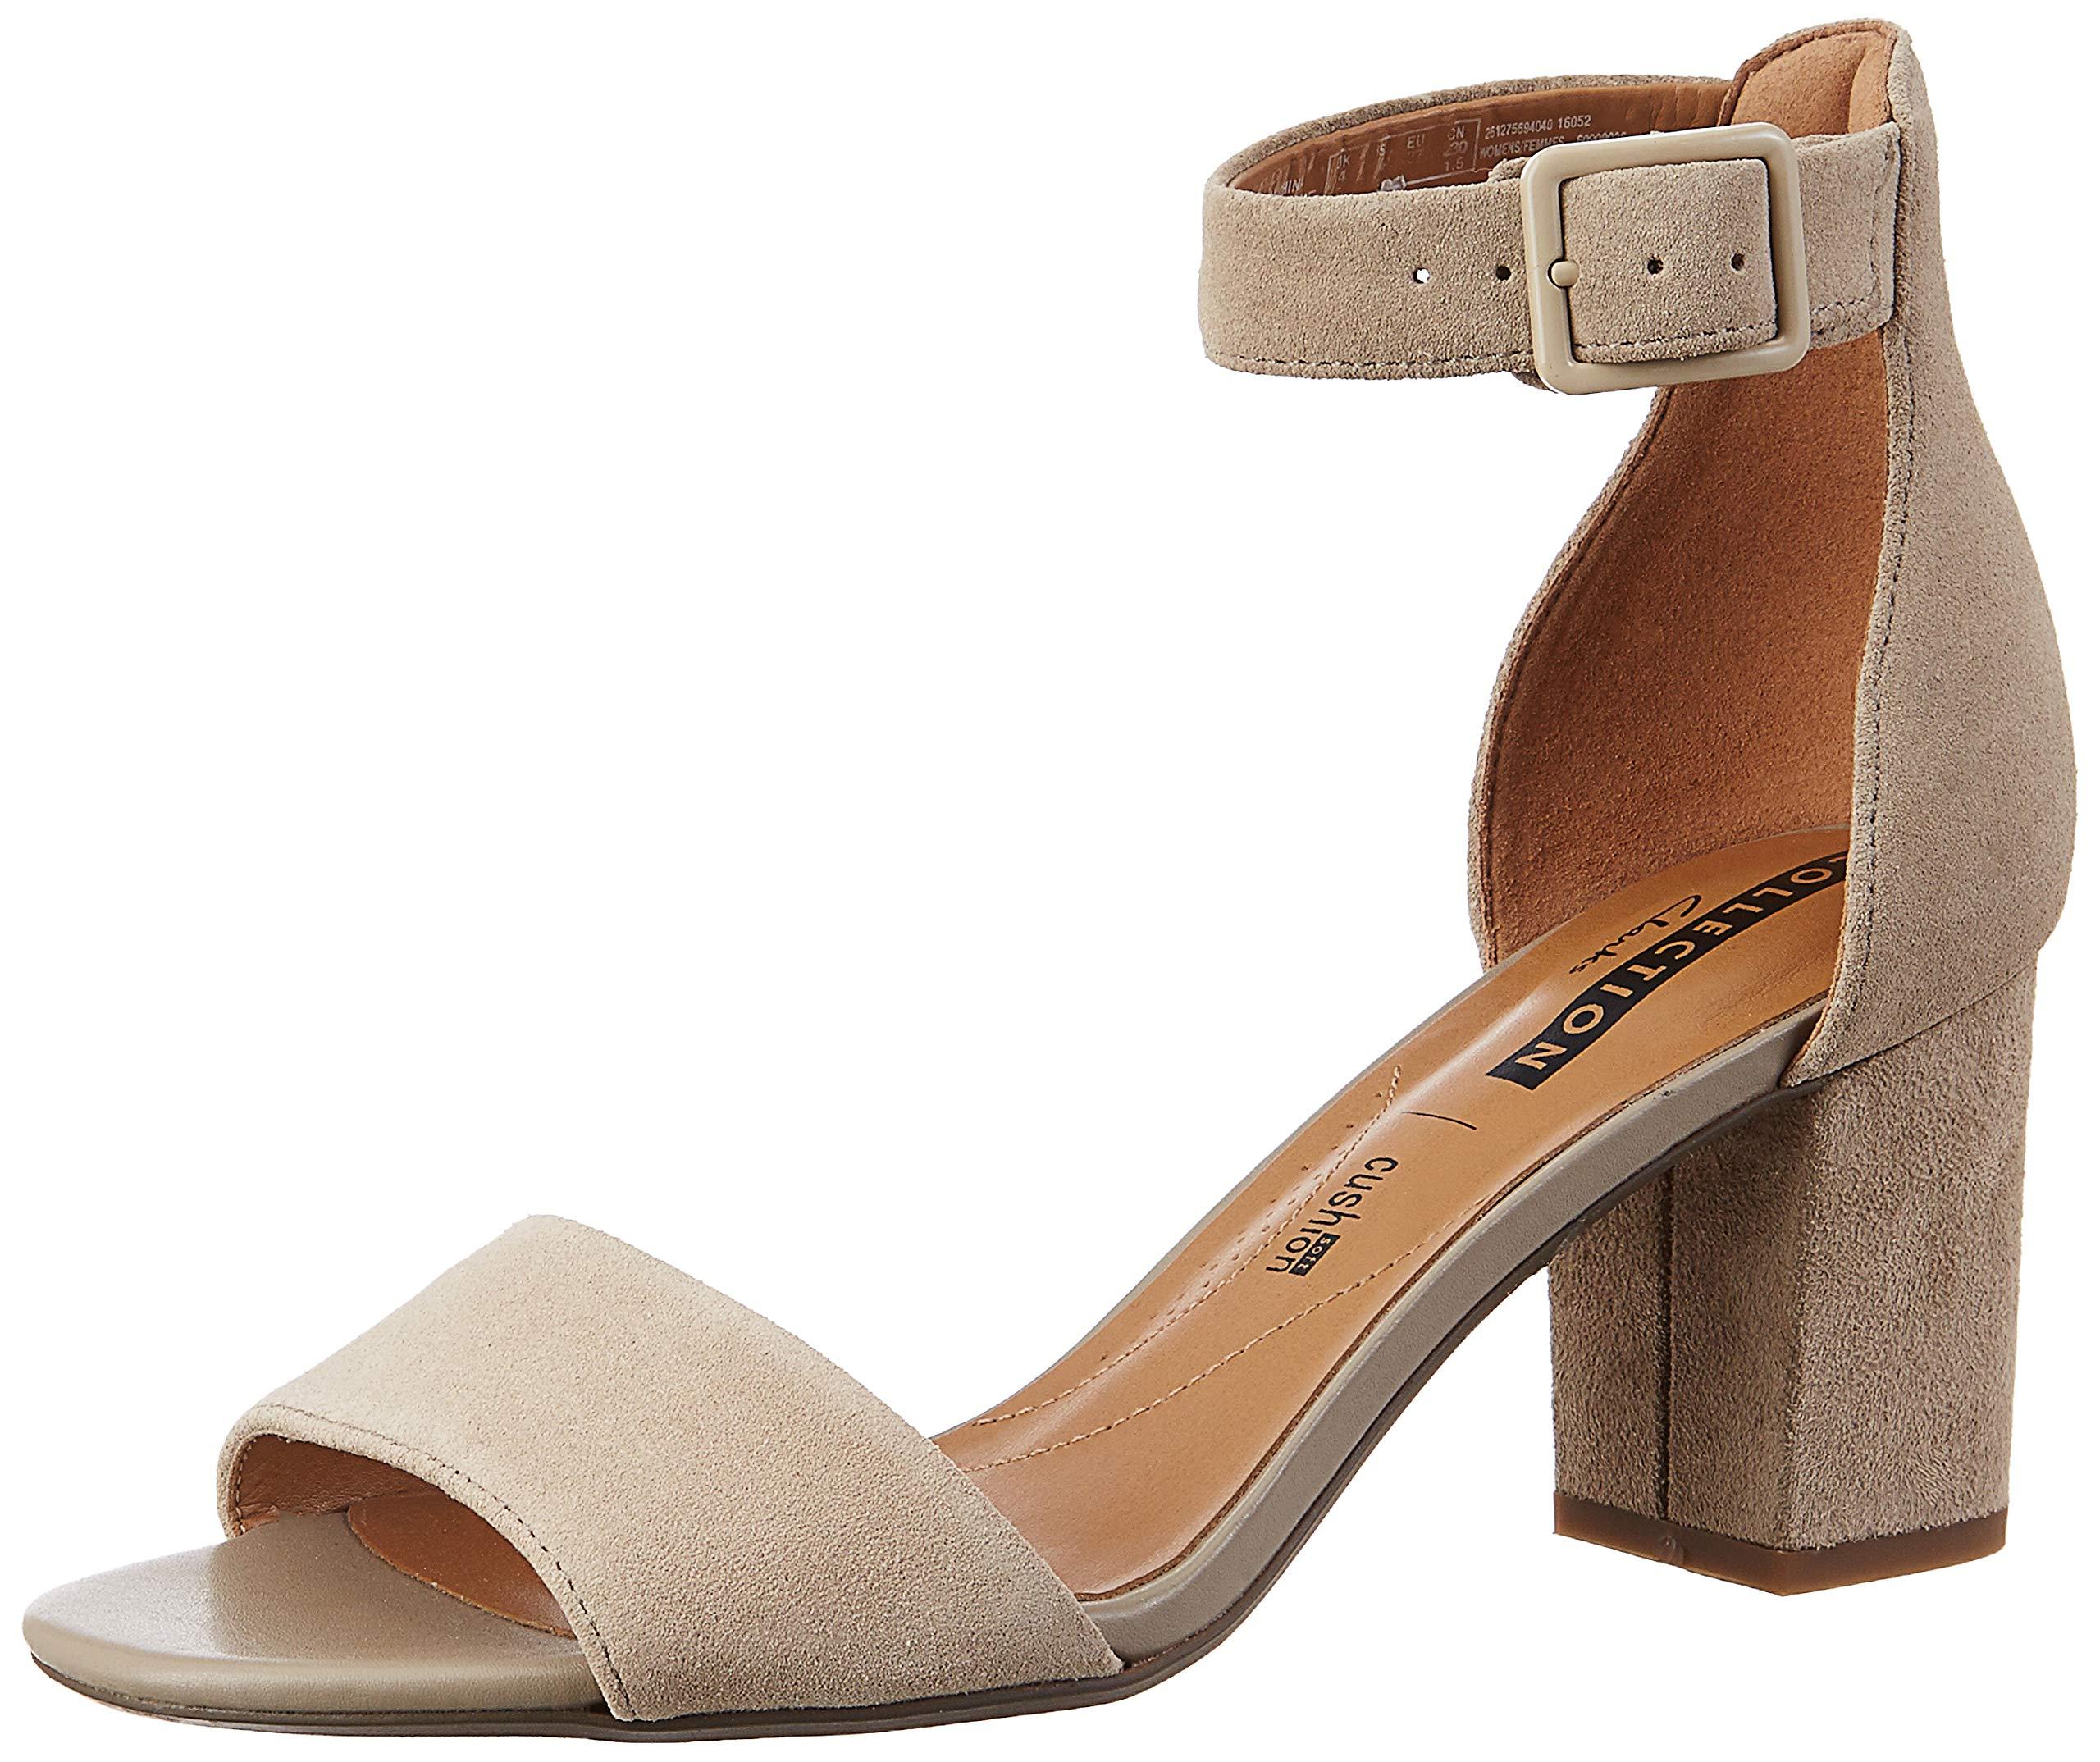 8a533996268 Clarks Women's Deva Mae Fashion Sandals - Gia Designer